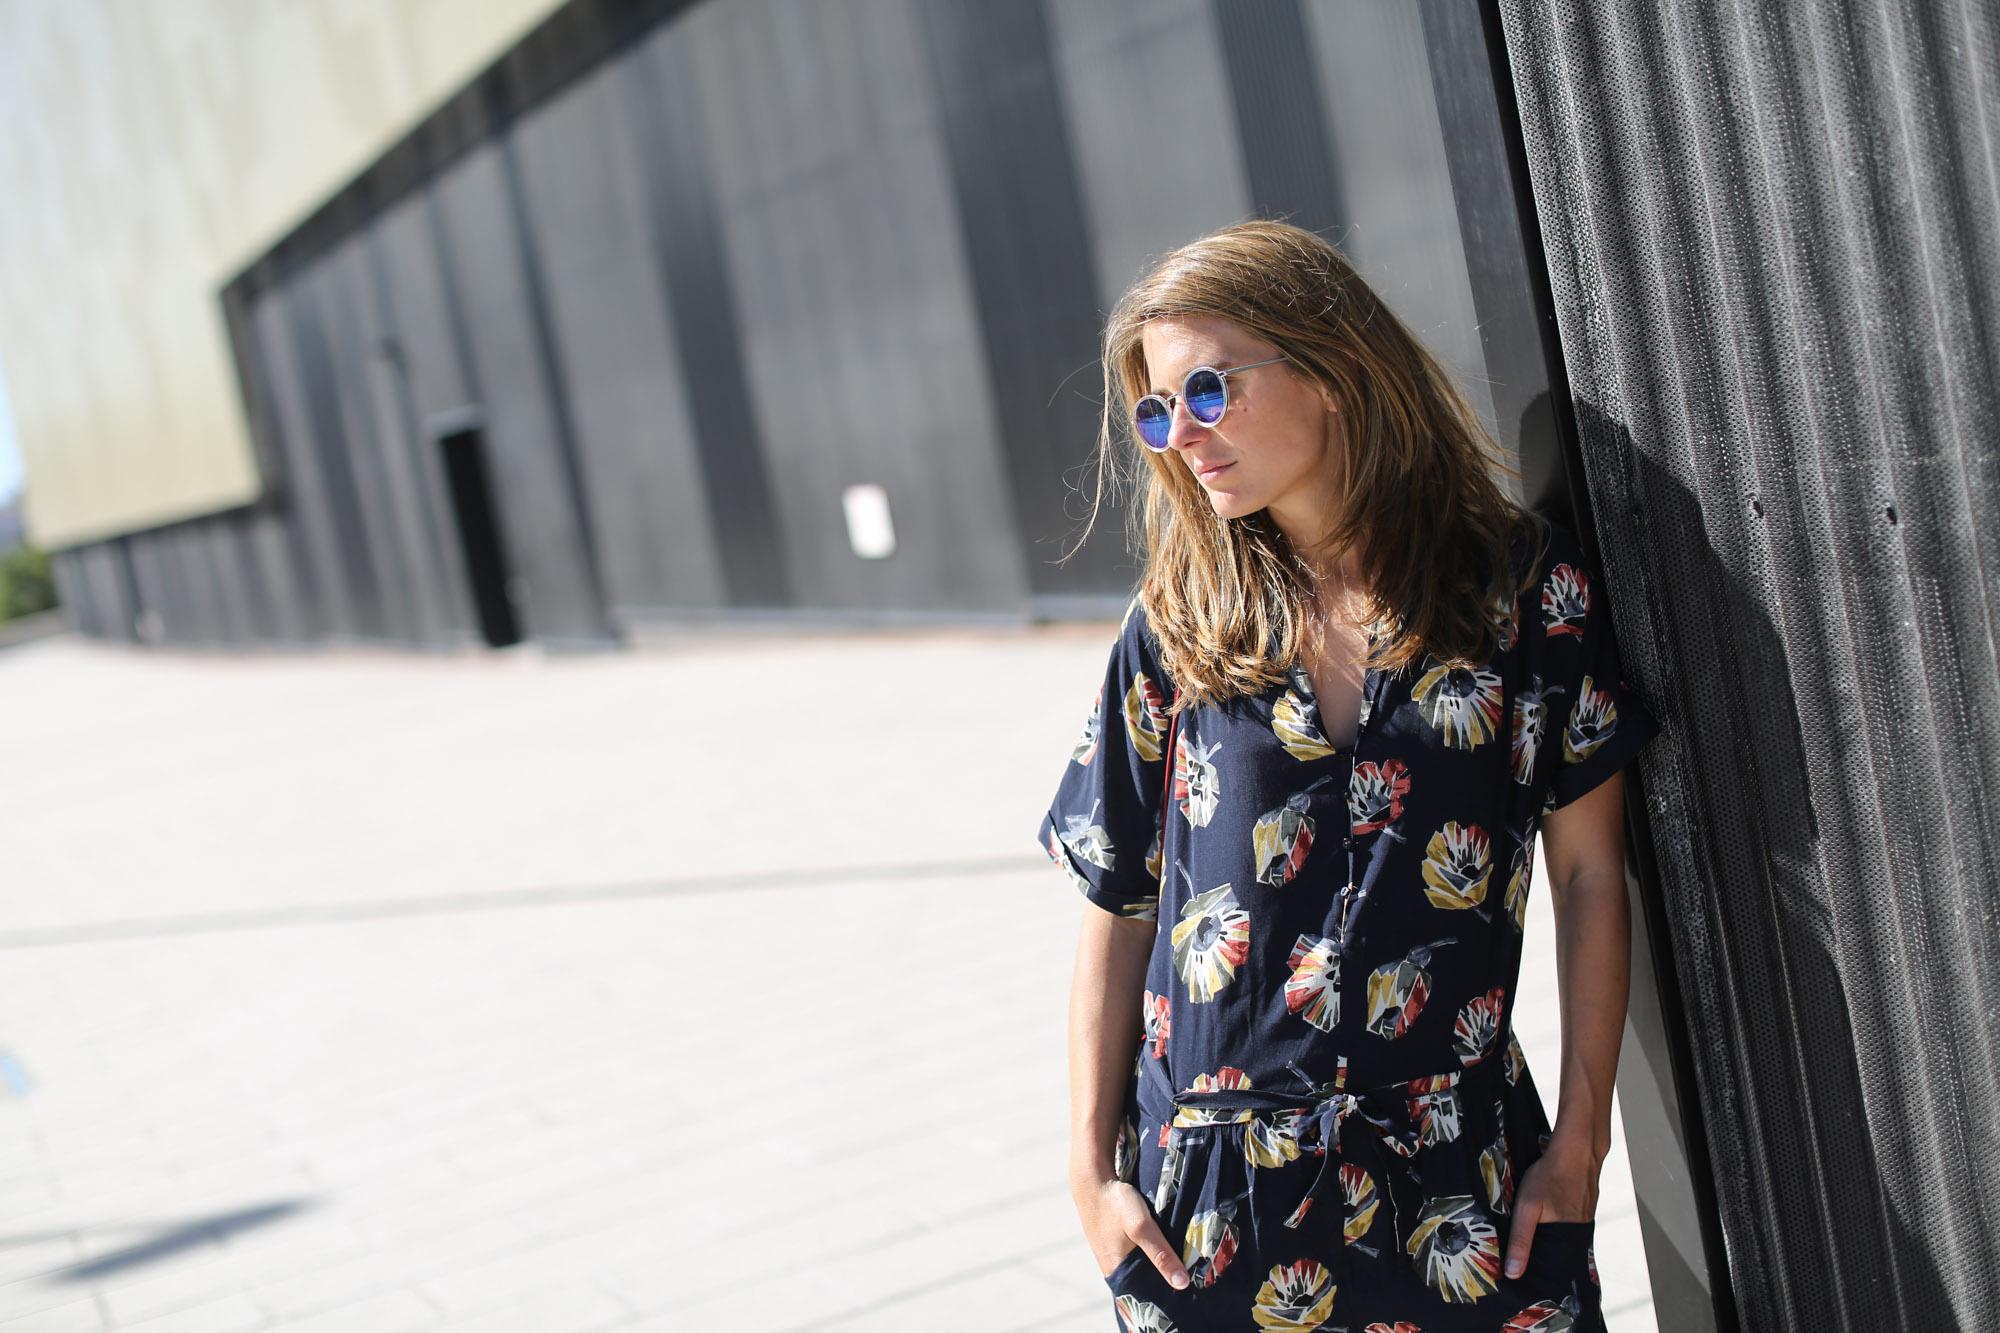 Clochet-streetstyle-vagabond-sliders-zara-flowers-jumpsuit-10